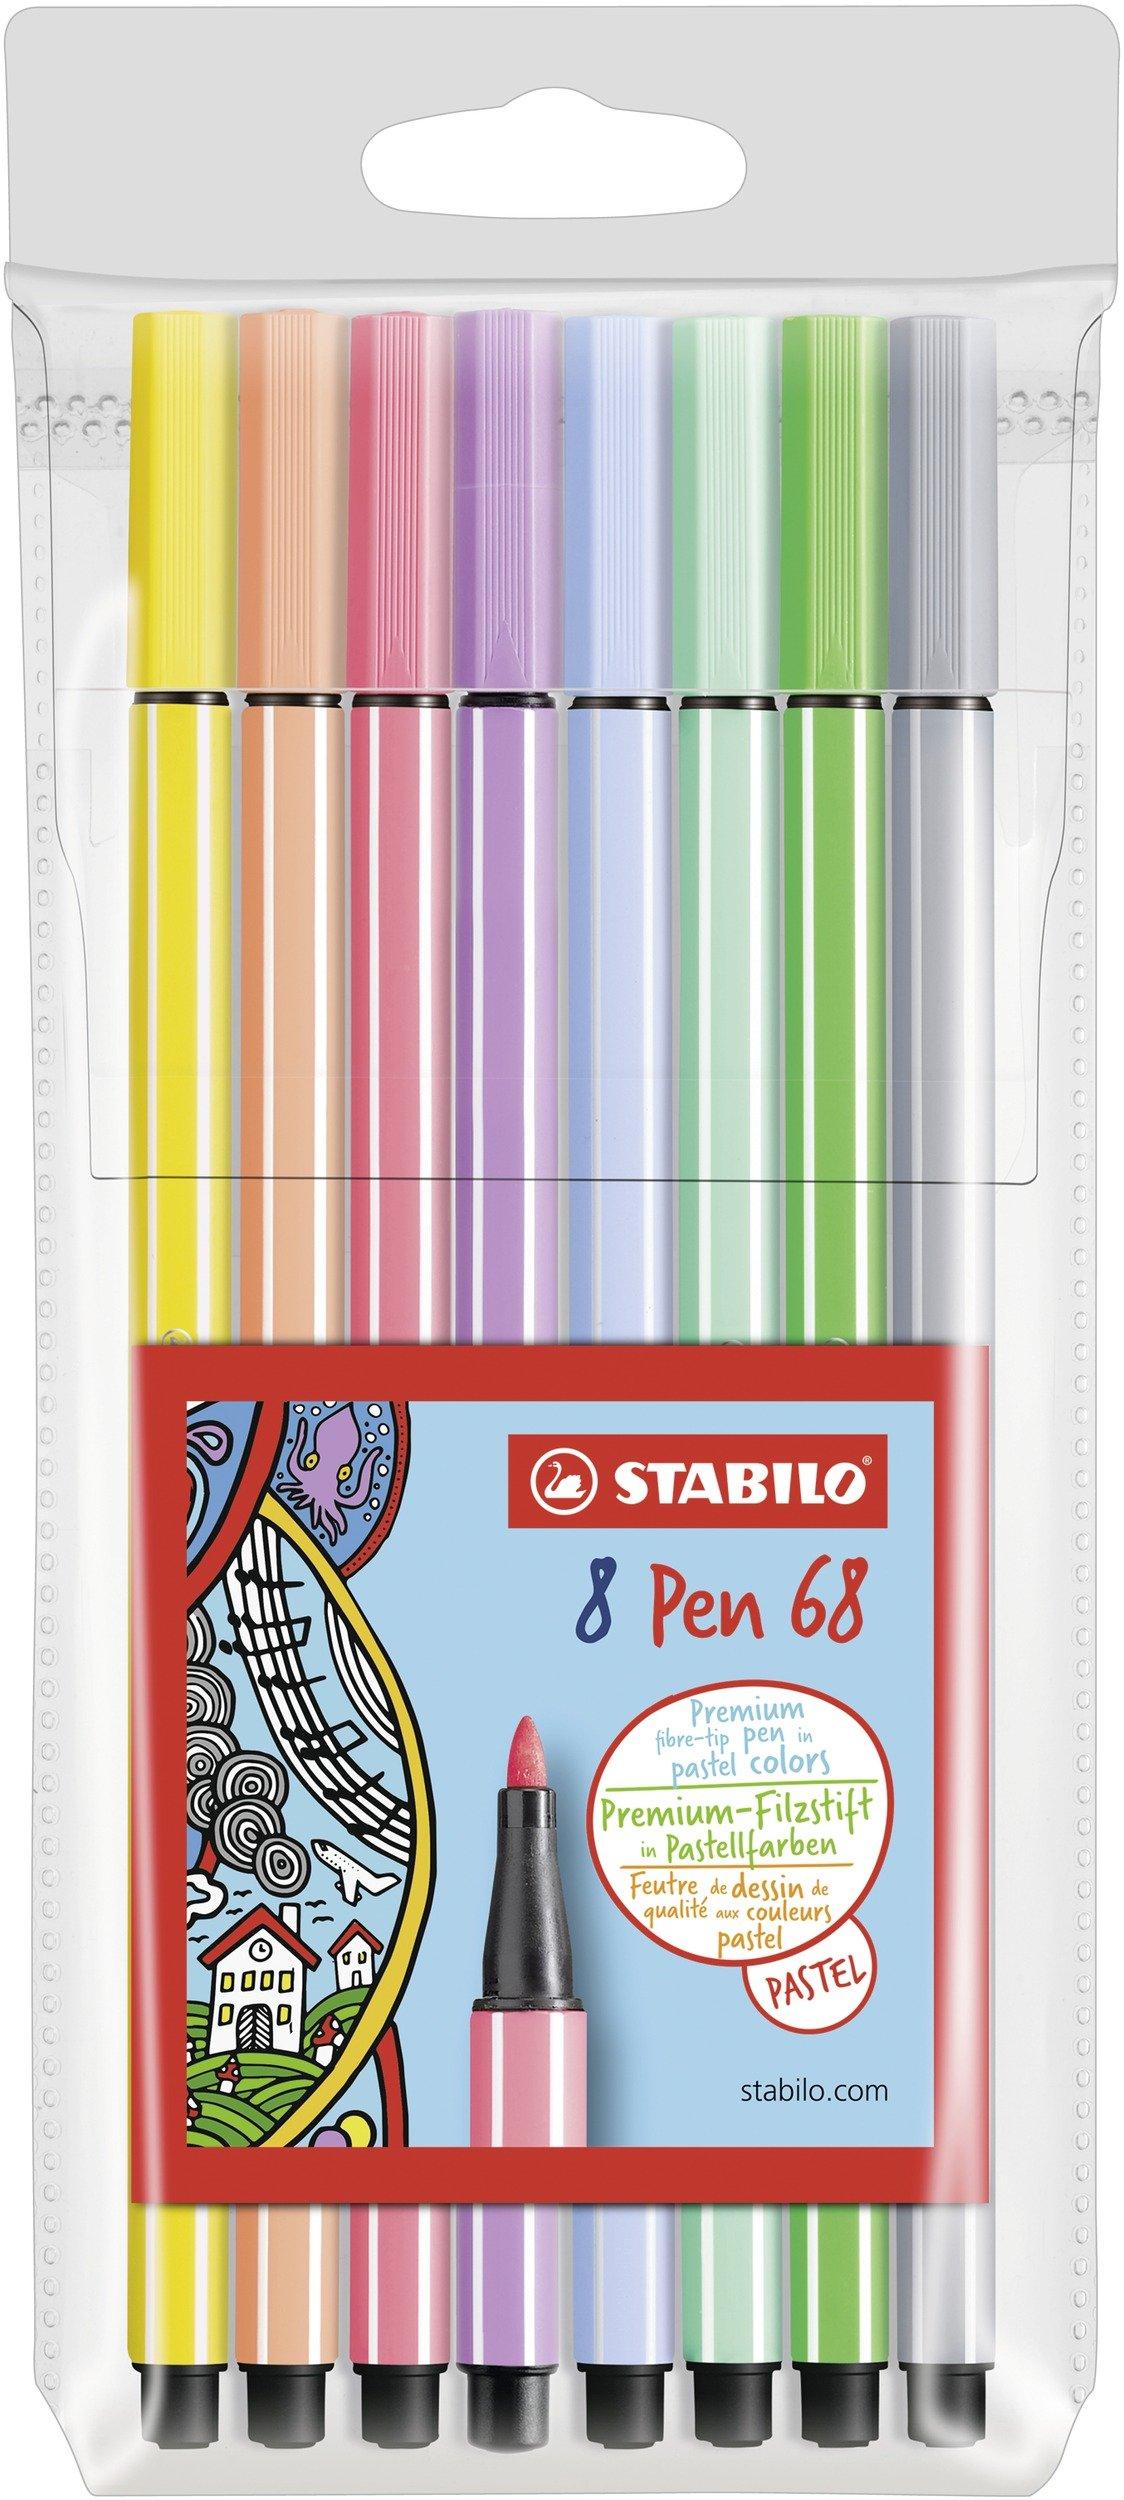 Stabilo 68/8–01Premium De Fieltro lápiz 68, 8Unidades, Color Pastel